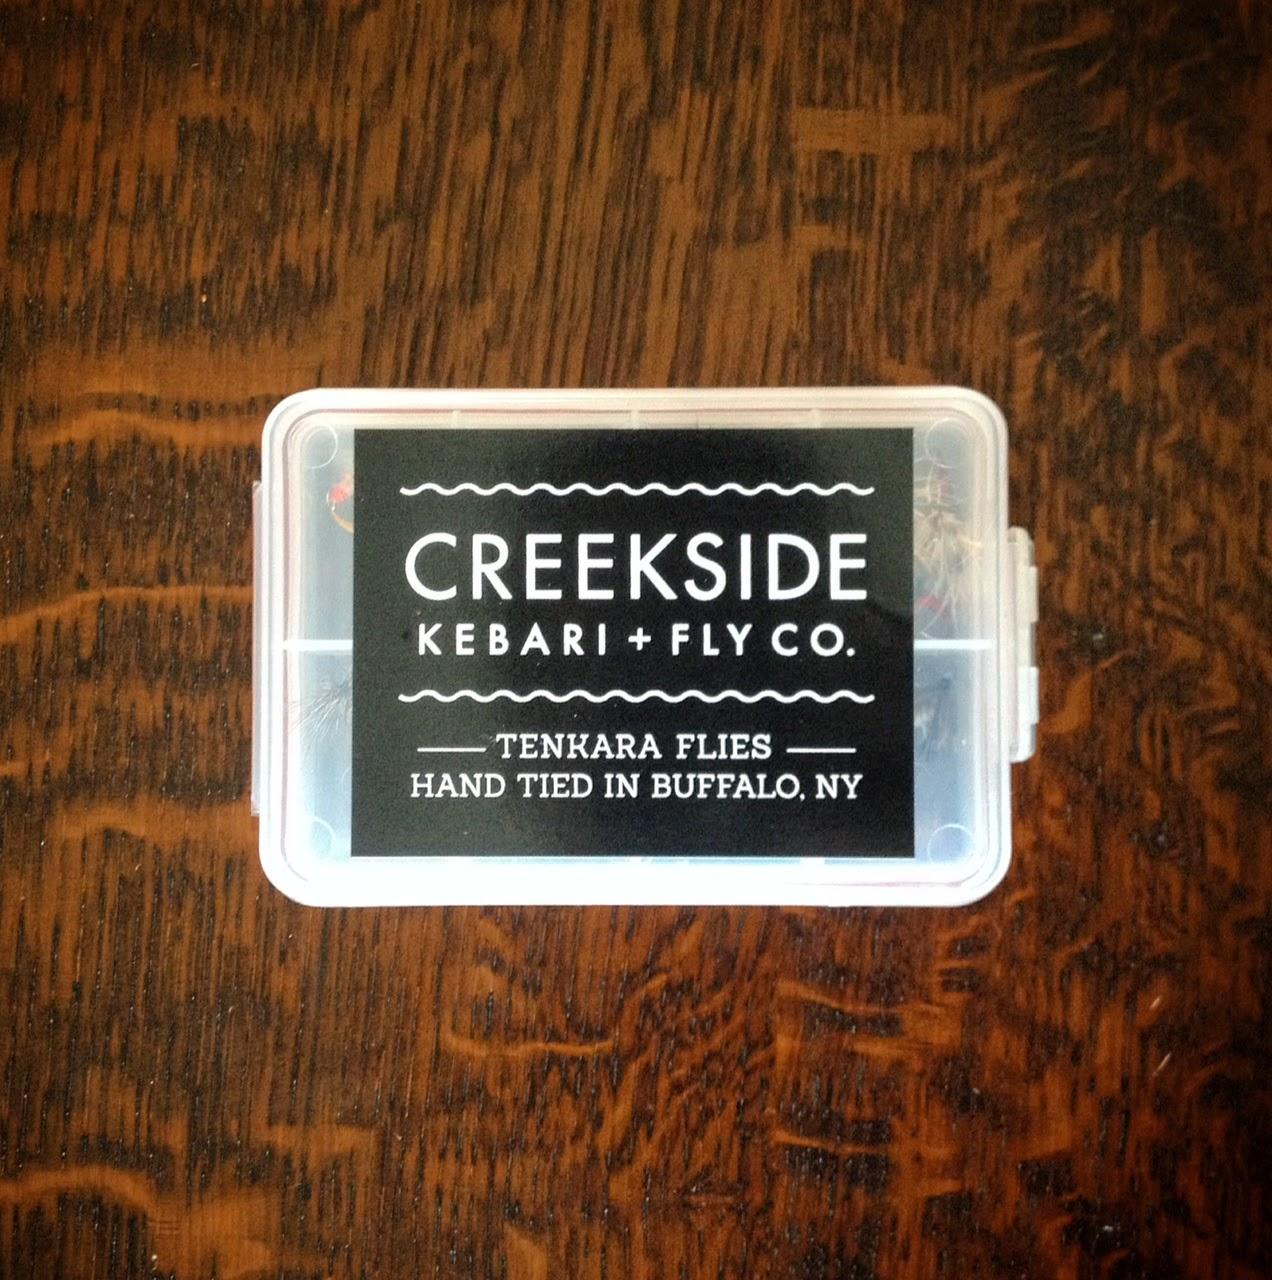 54a2e8fe1b9 Tenkara Tuesday - Interview With Robb Chunco of Creekside Kebari + Fly Co.